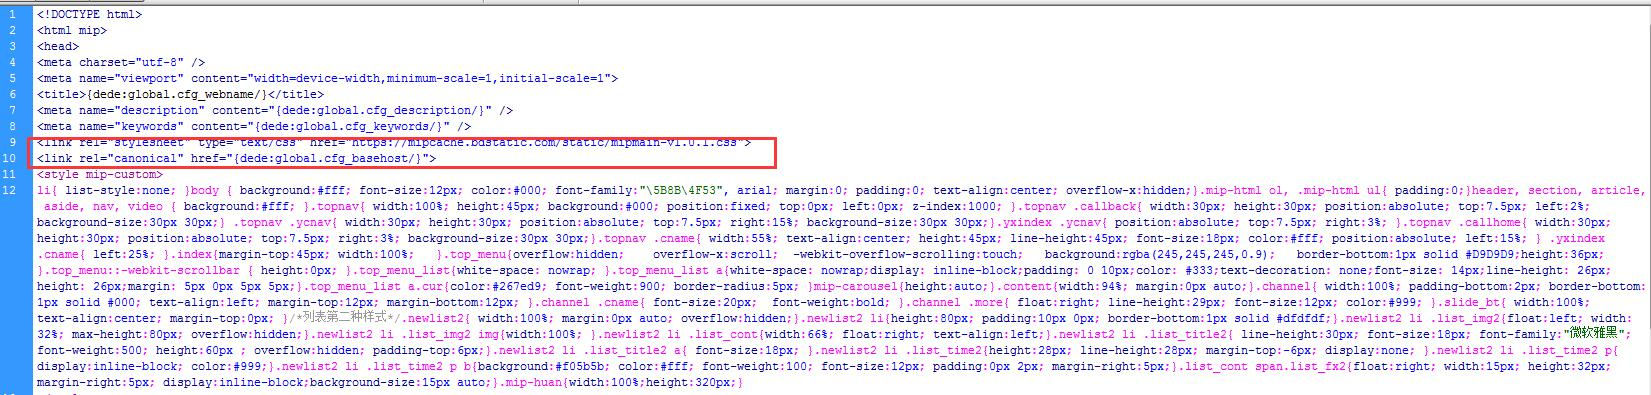 wordpress,帝国CMS,DEDECMS的百度MIP项目改造,详细改造教程及模板下载! 建站程序 第32张-泥人传说